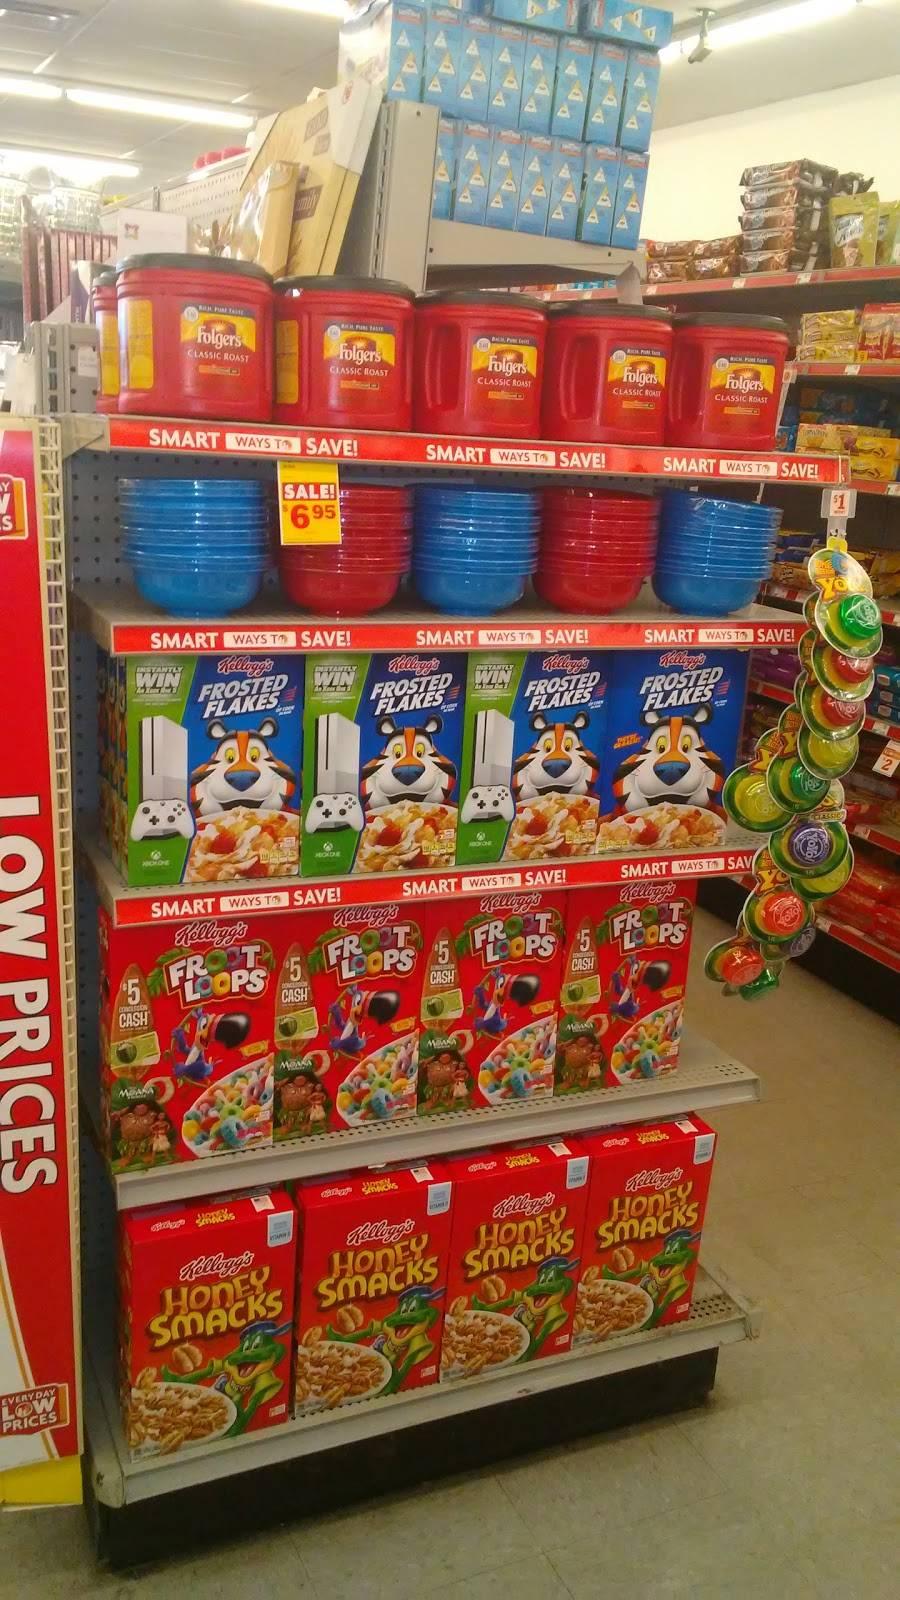 Family Dollar - supermarket  | Photo 2 of 7 | Address: 2105 57th Ave N, Brooklyn Center, MN 55430, USA | Phone: (763) 560-9697